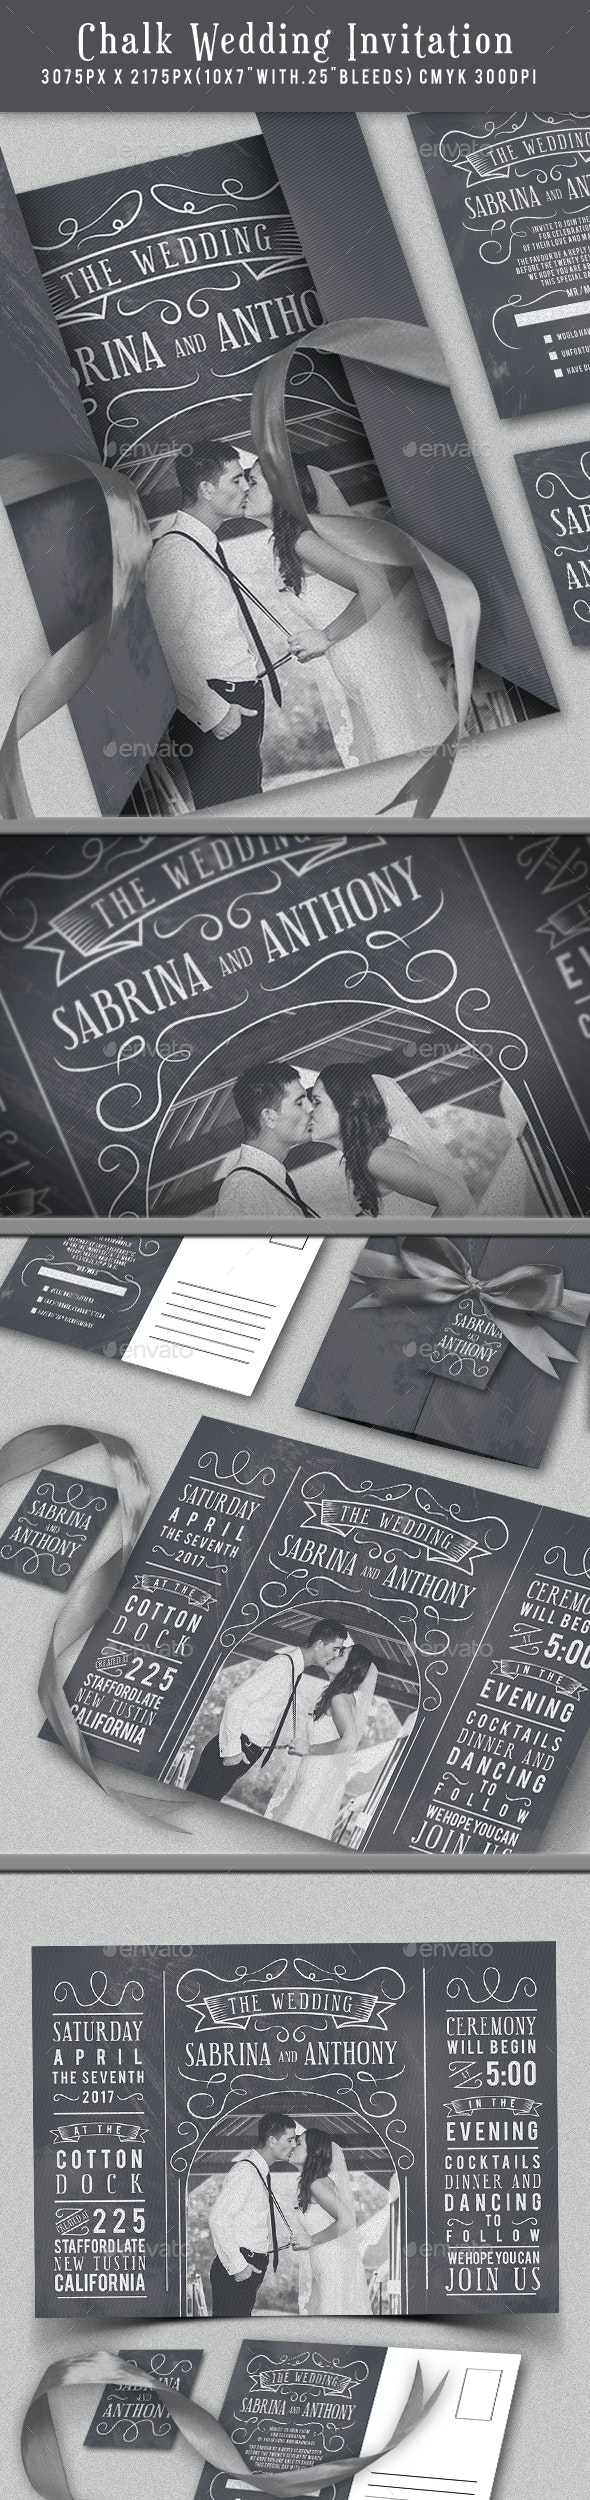 Chalk Wedding Invitation - Weddings Cards & Invites